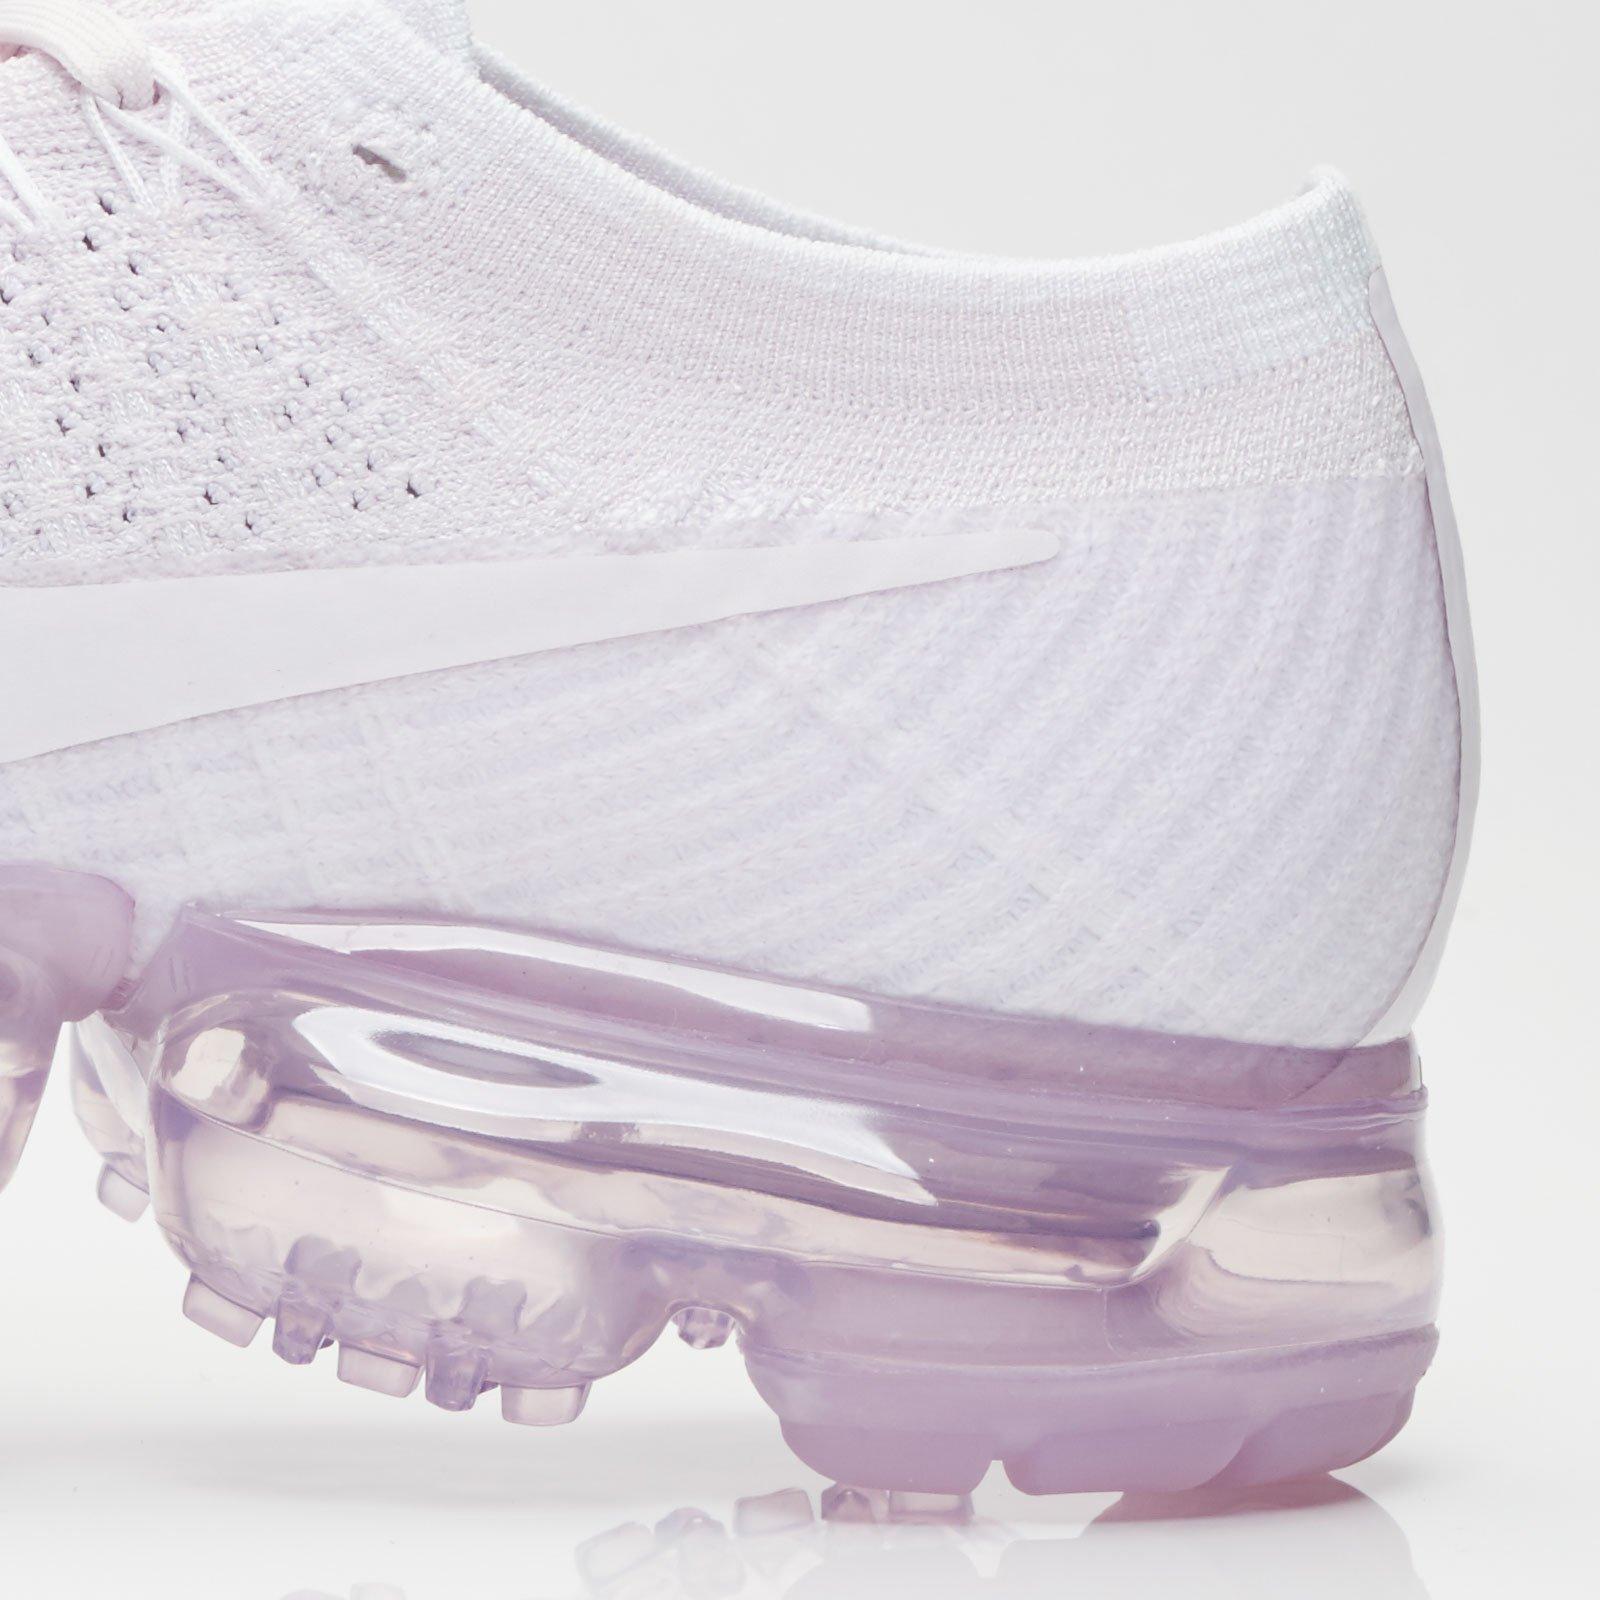 4ebe88b743b Nike Wmns Air Vapormax Flyknit - 849557-501 - Sneakersnstuff ...